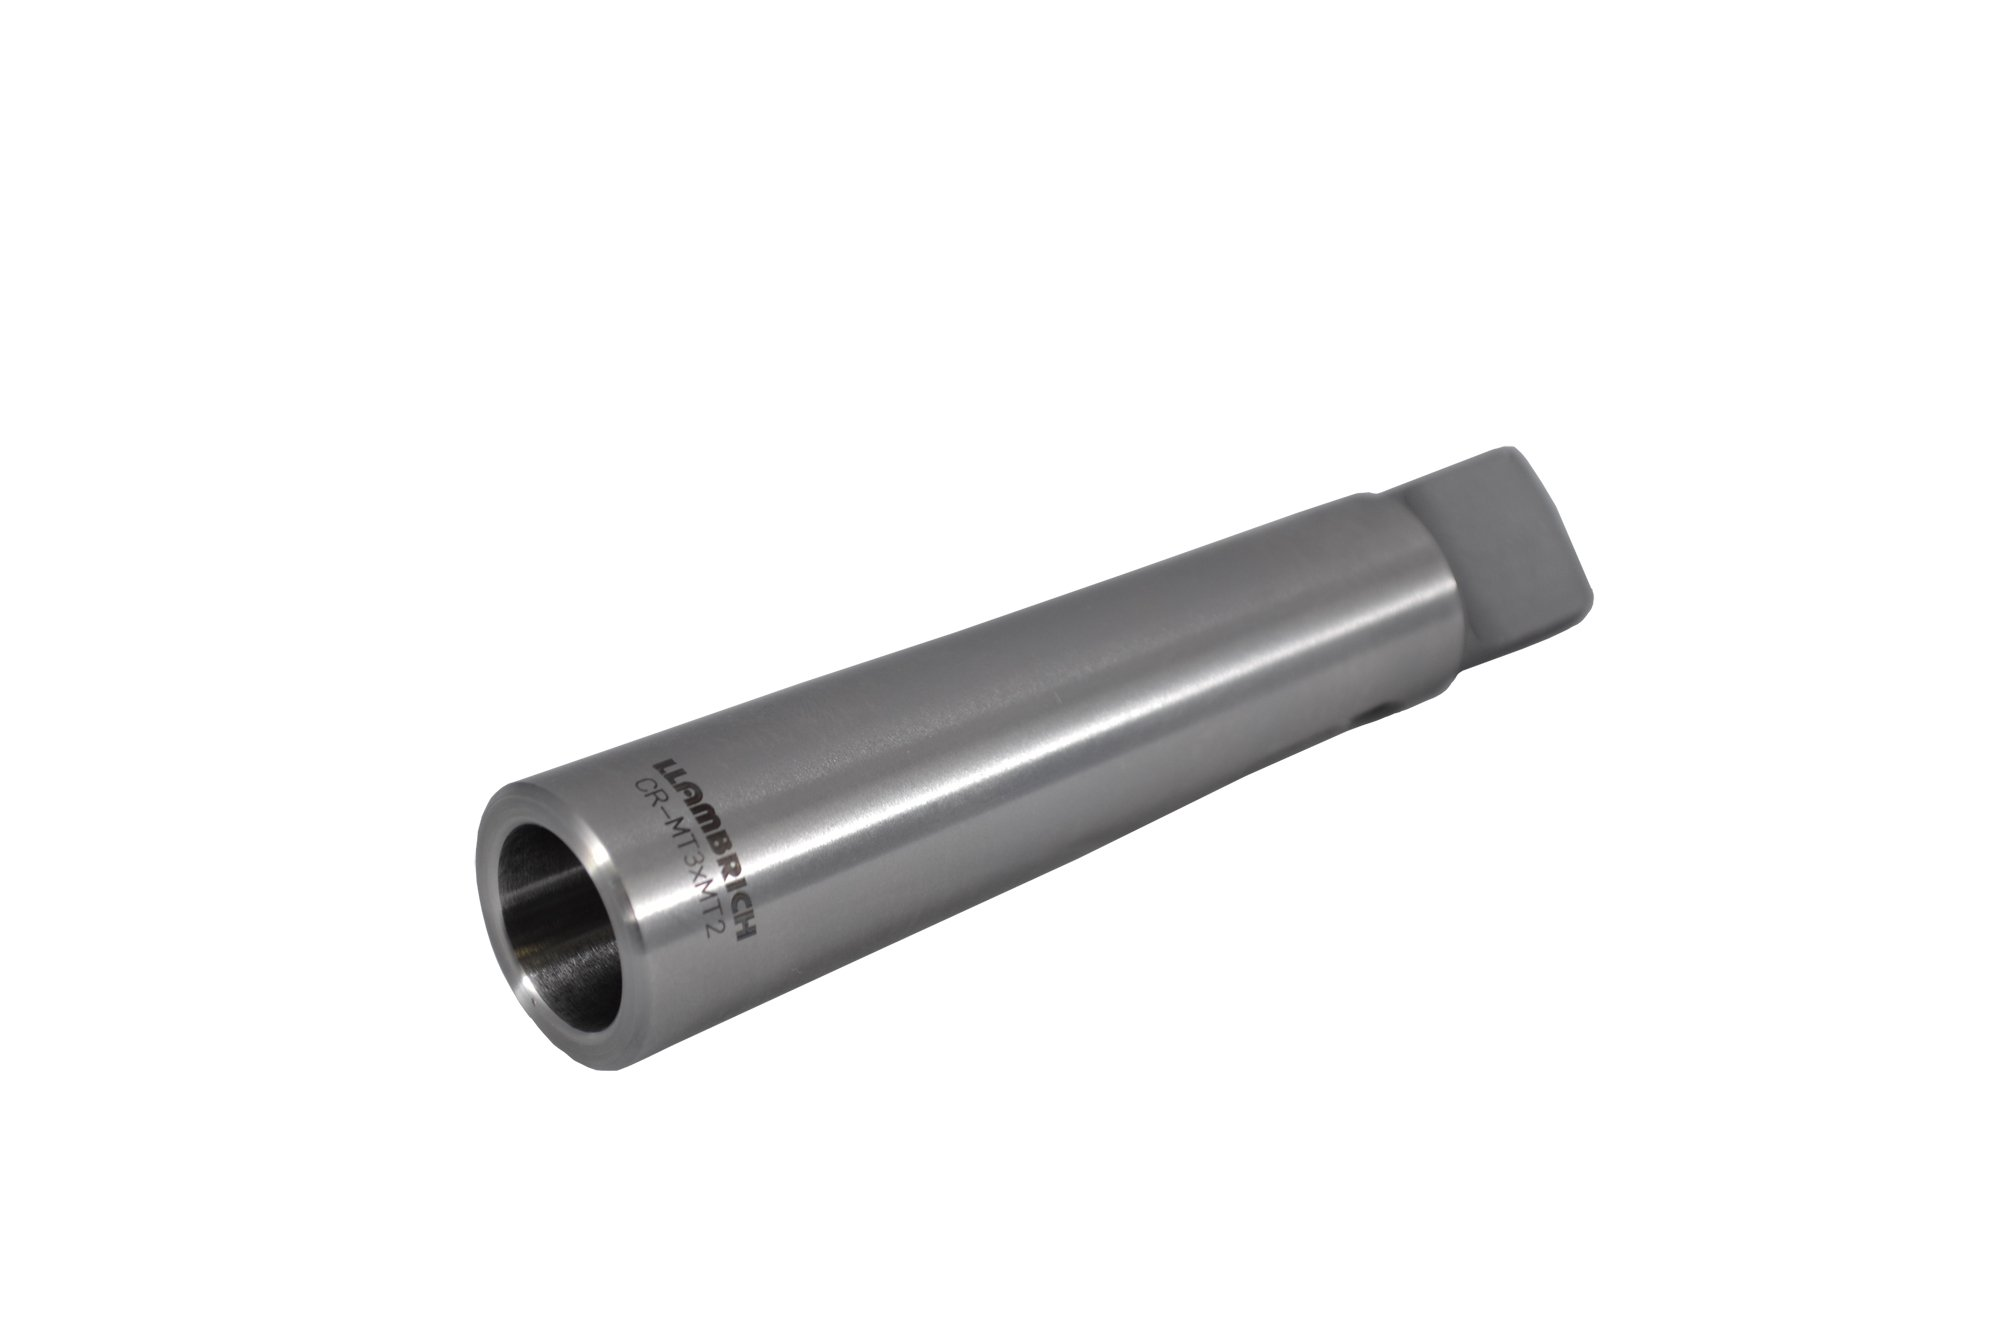 Llambrich CR-3 x 2 Drill Sleeve, 3-2 Morse Taper, Hardened Steel